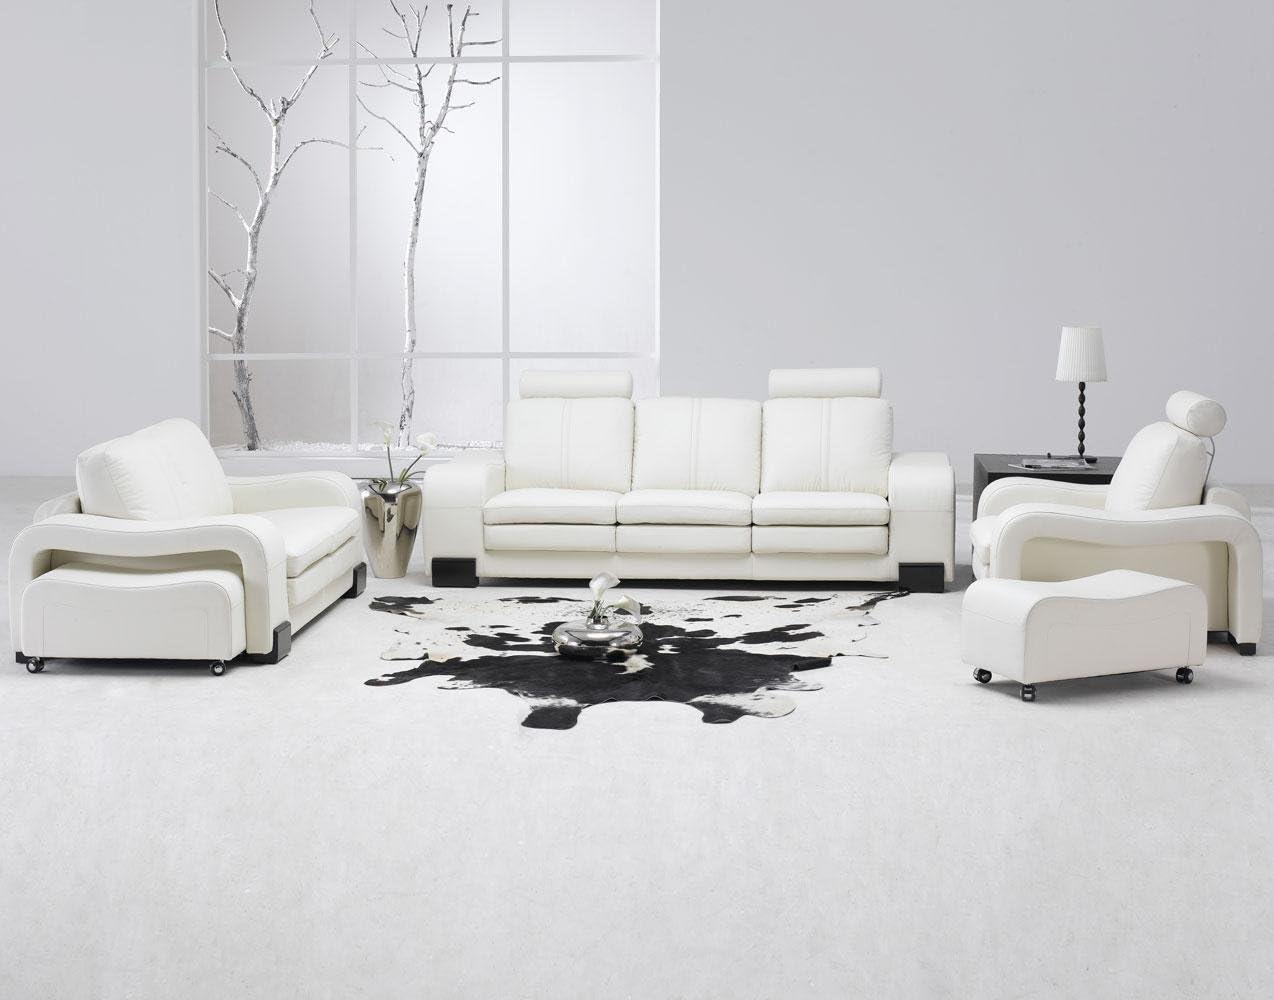 Amazon Com Modern 5 Pcs White Leather Living Room Set Furniture Decor